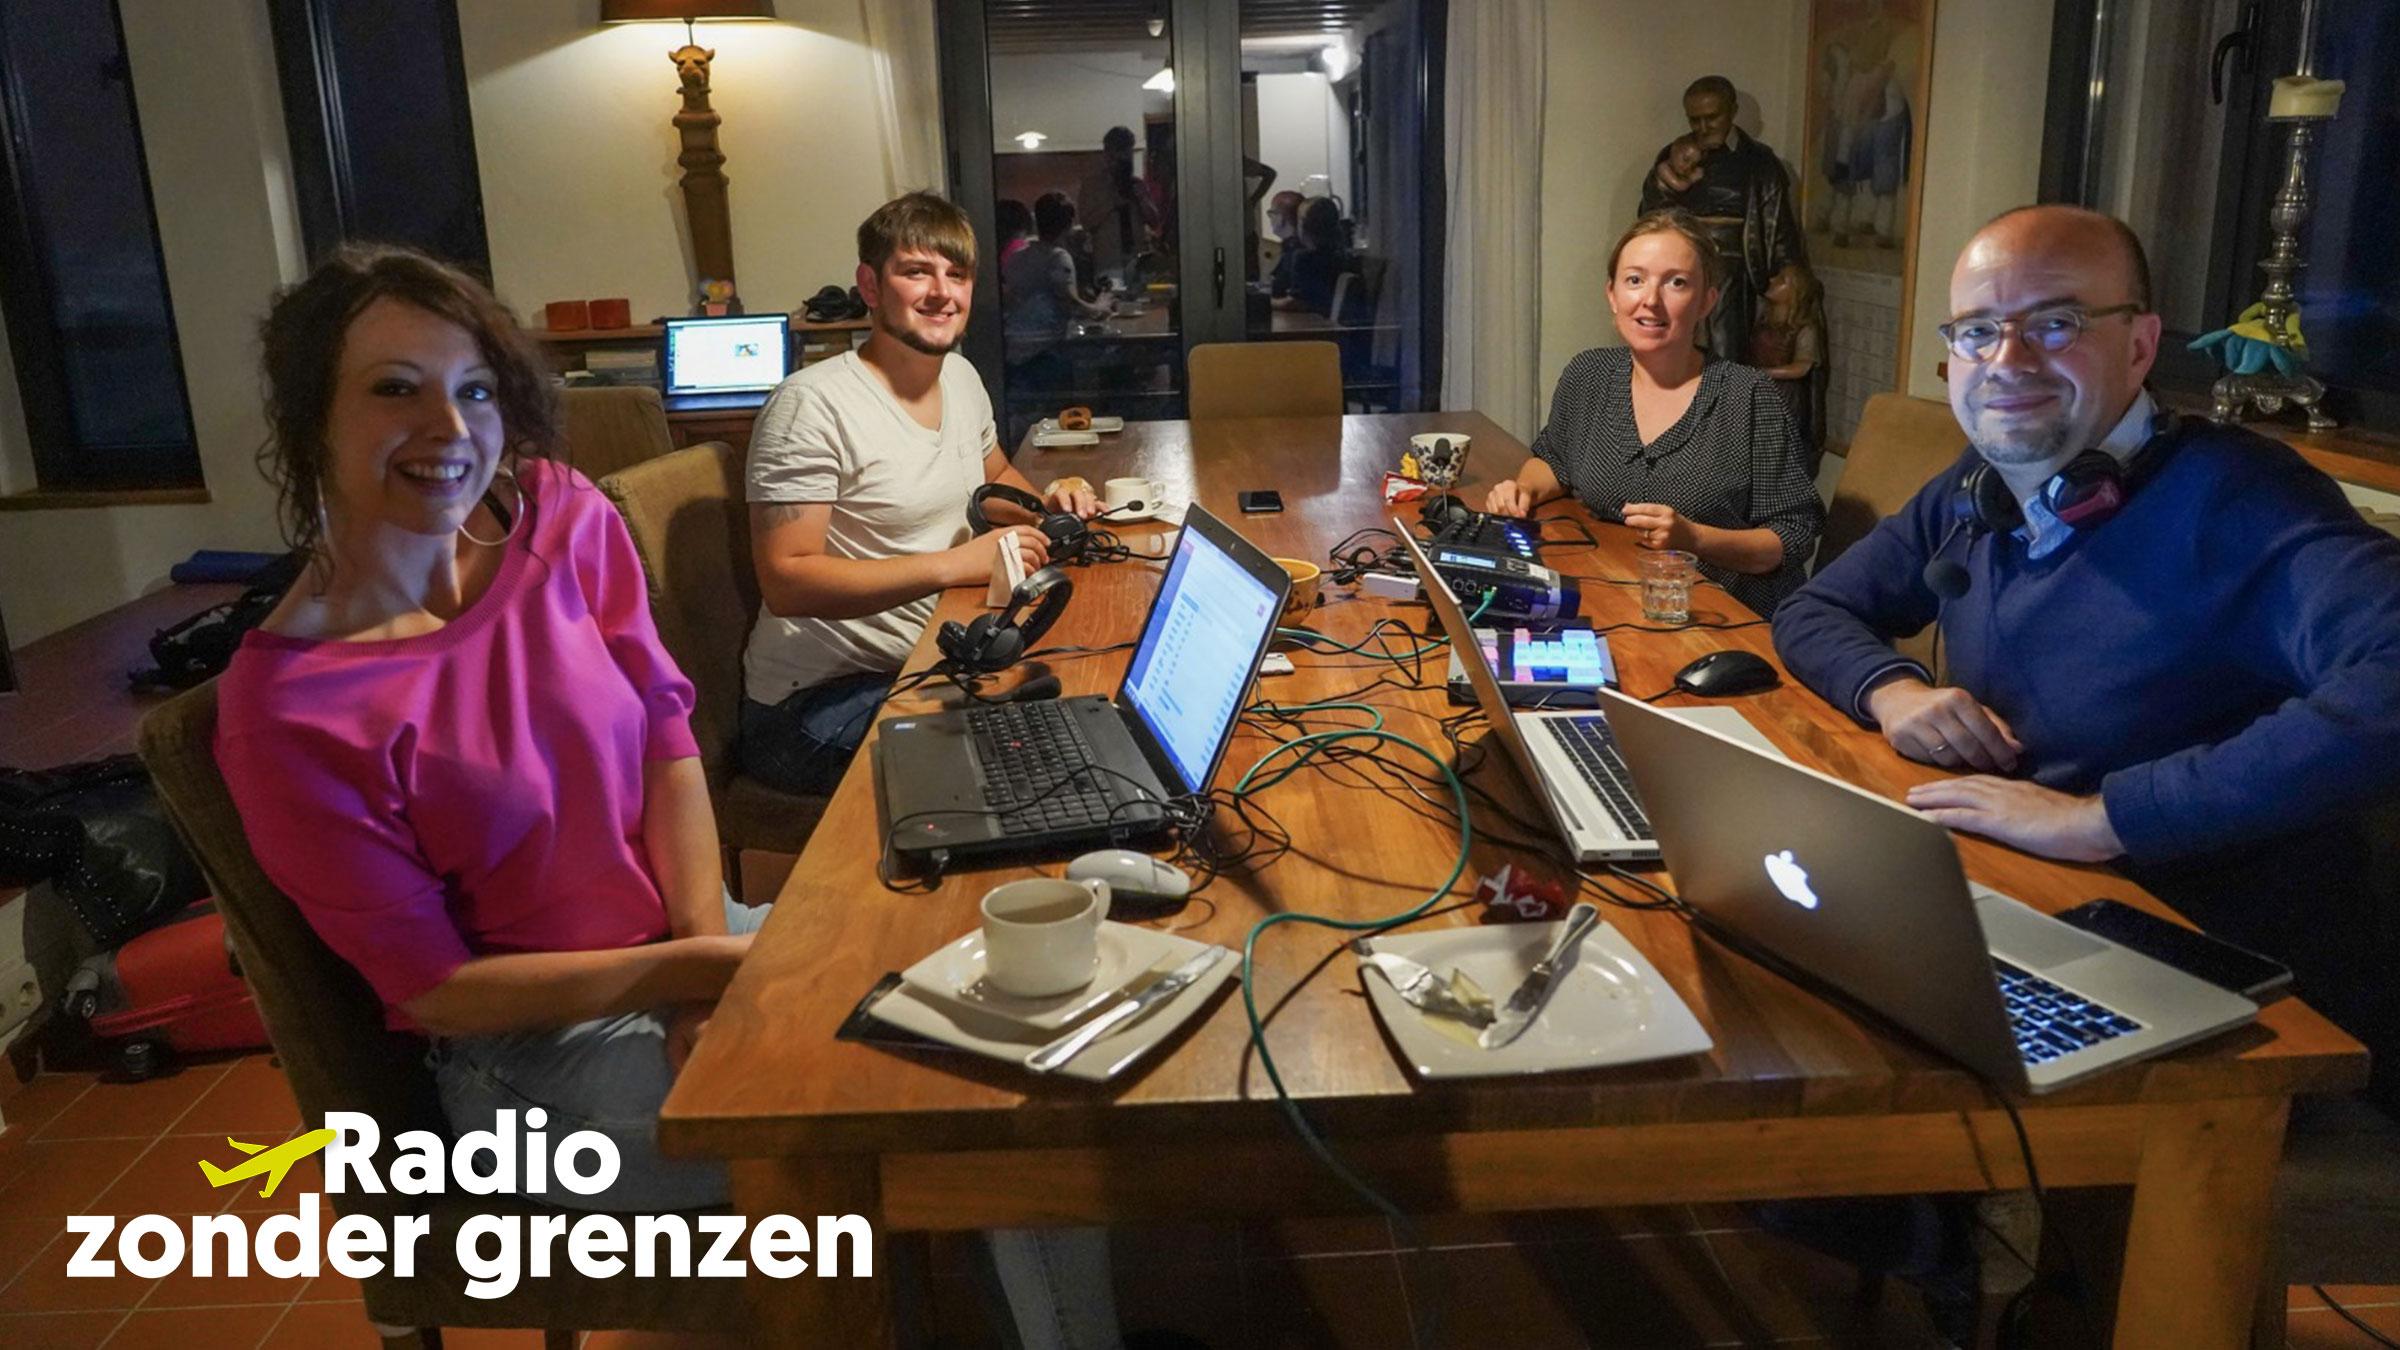 2018 joe radiozondergrenzen portugal 1